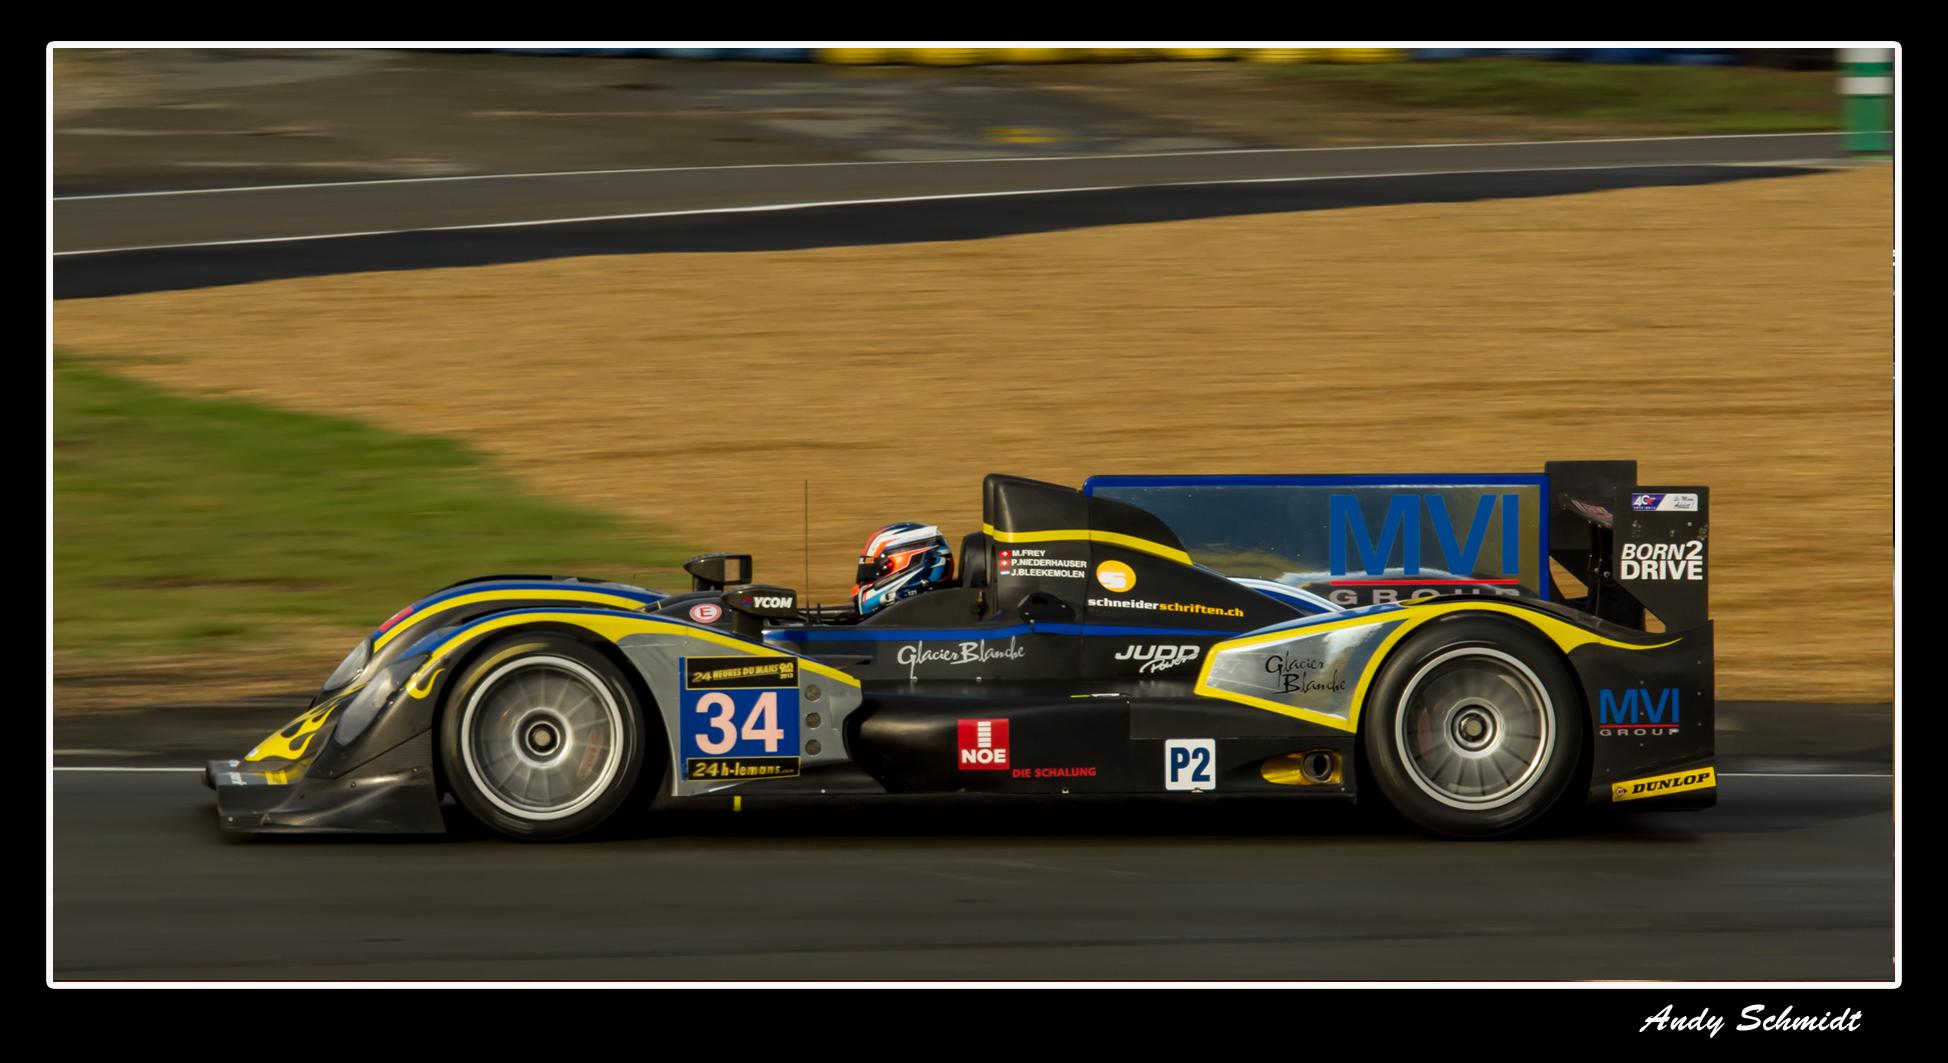 LMP 2 in Le Mans 2013